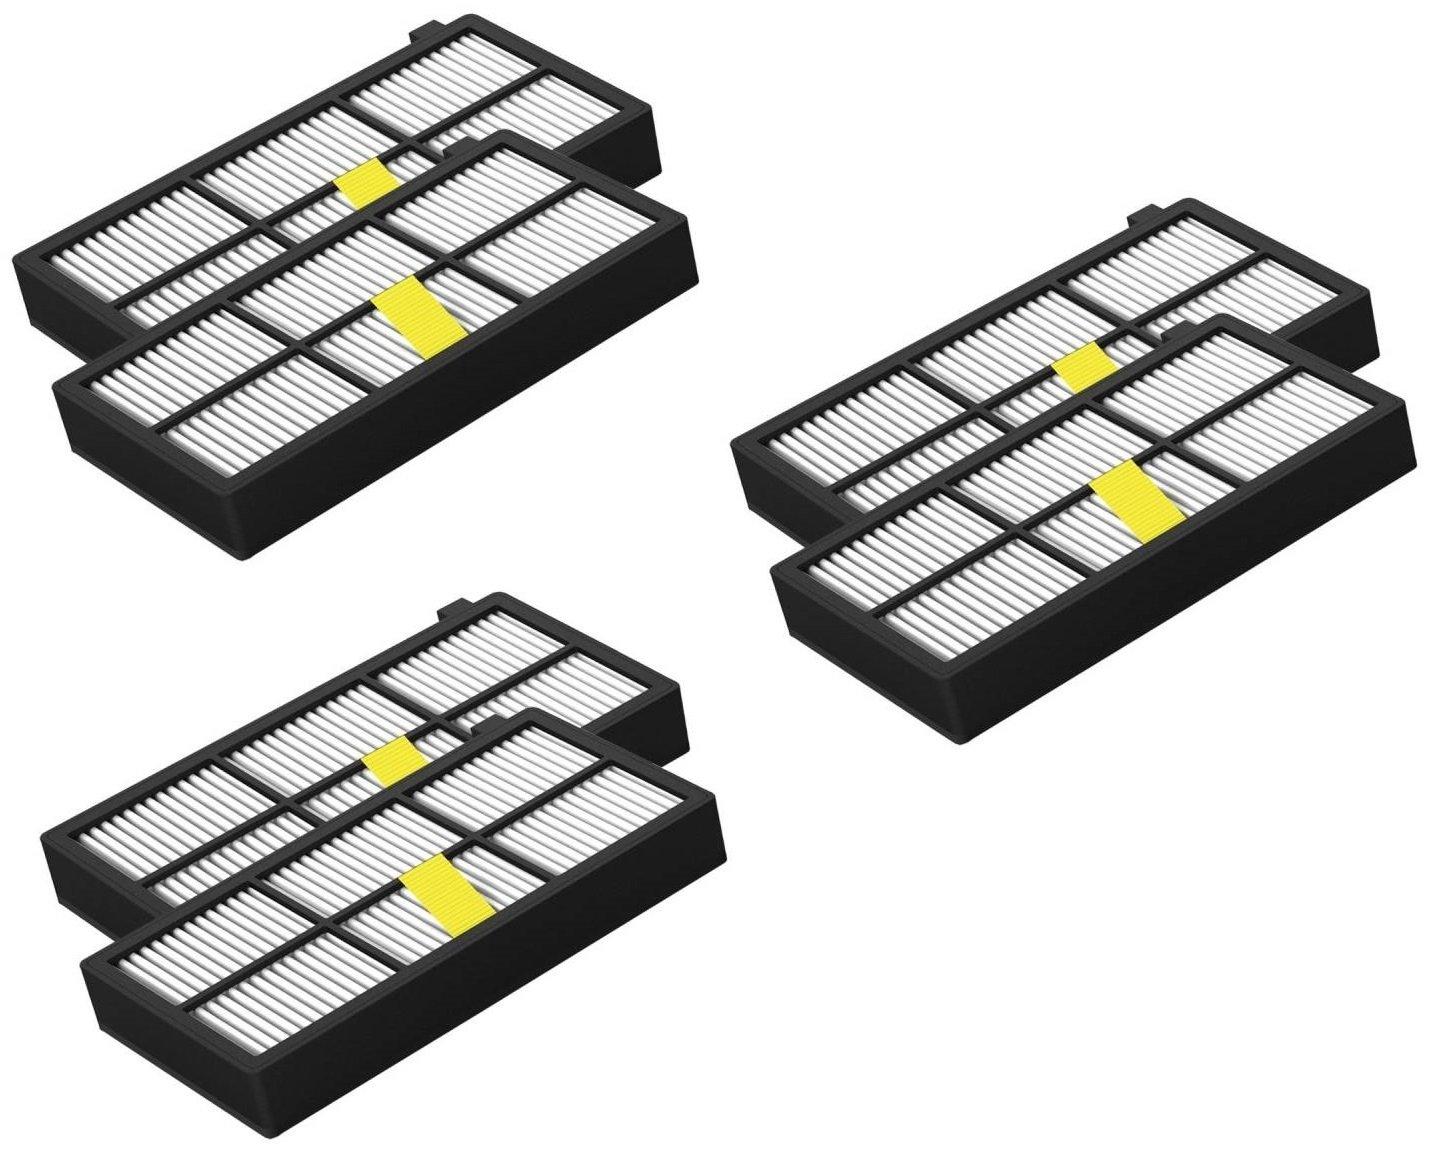 6Pack Filtro HEPA para iRobot Roomba la serie 800/900Er (870, 871, 880, 890, 980) Kniwelshop